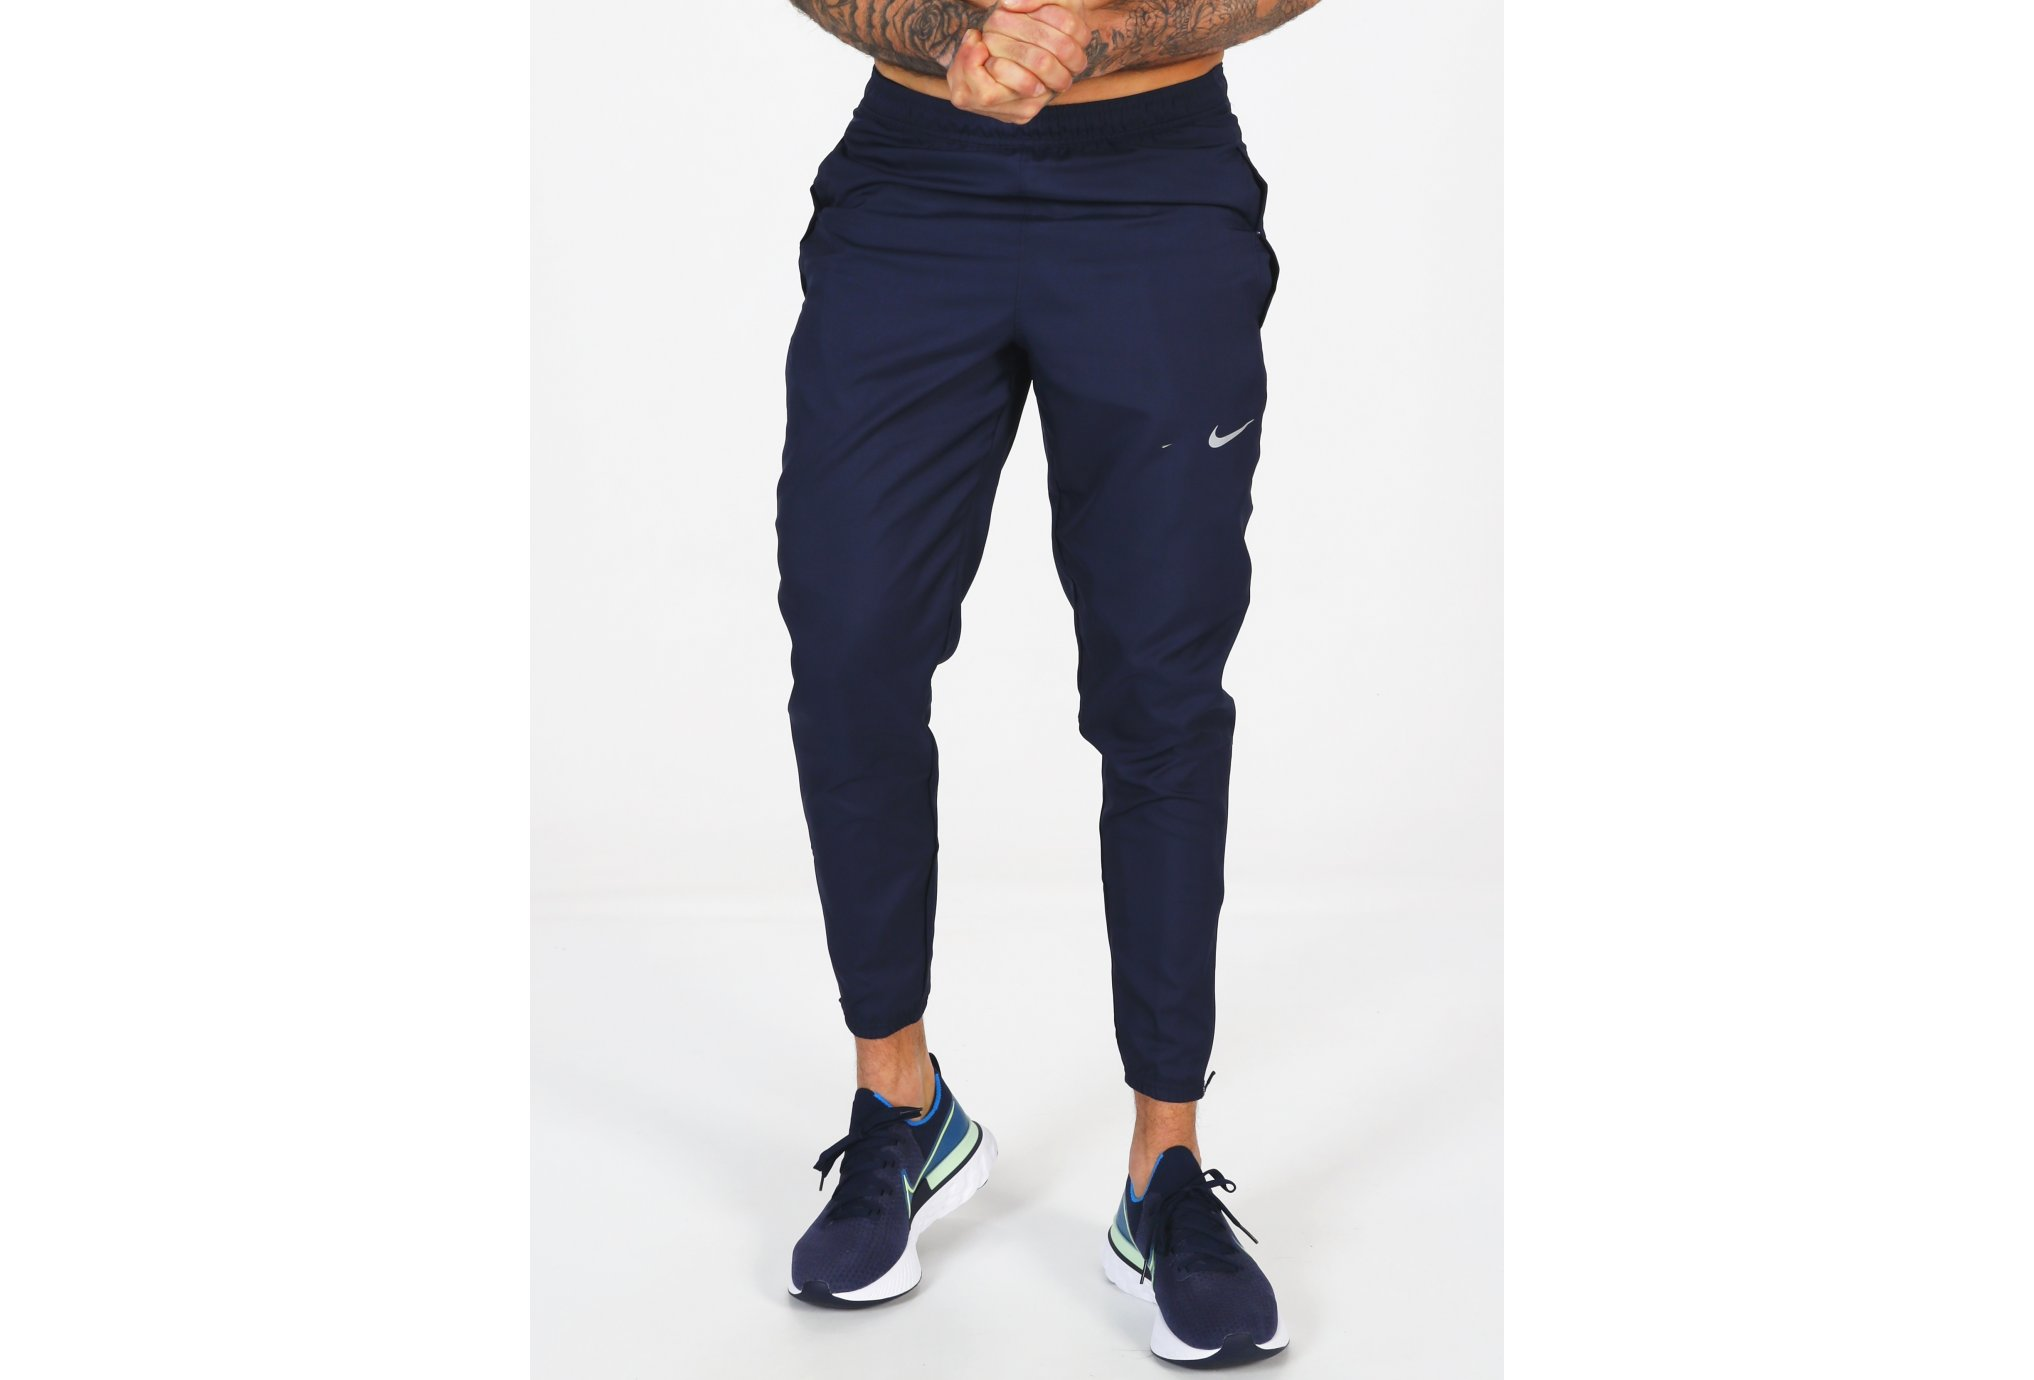 Nike Essential Woven M vêtement running homme